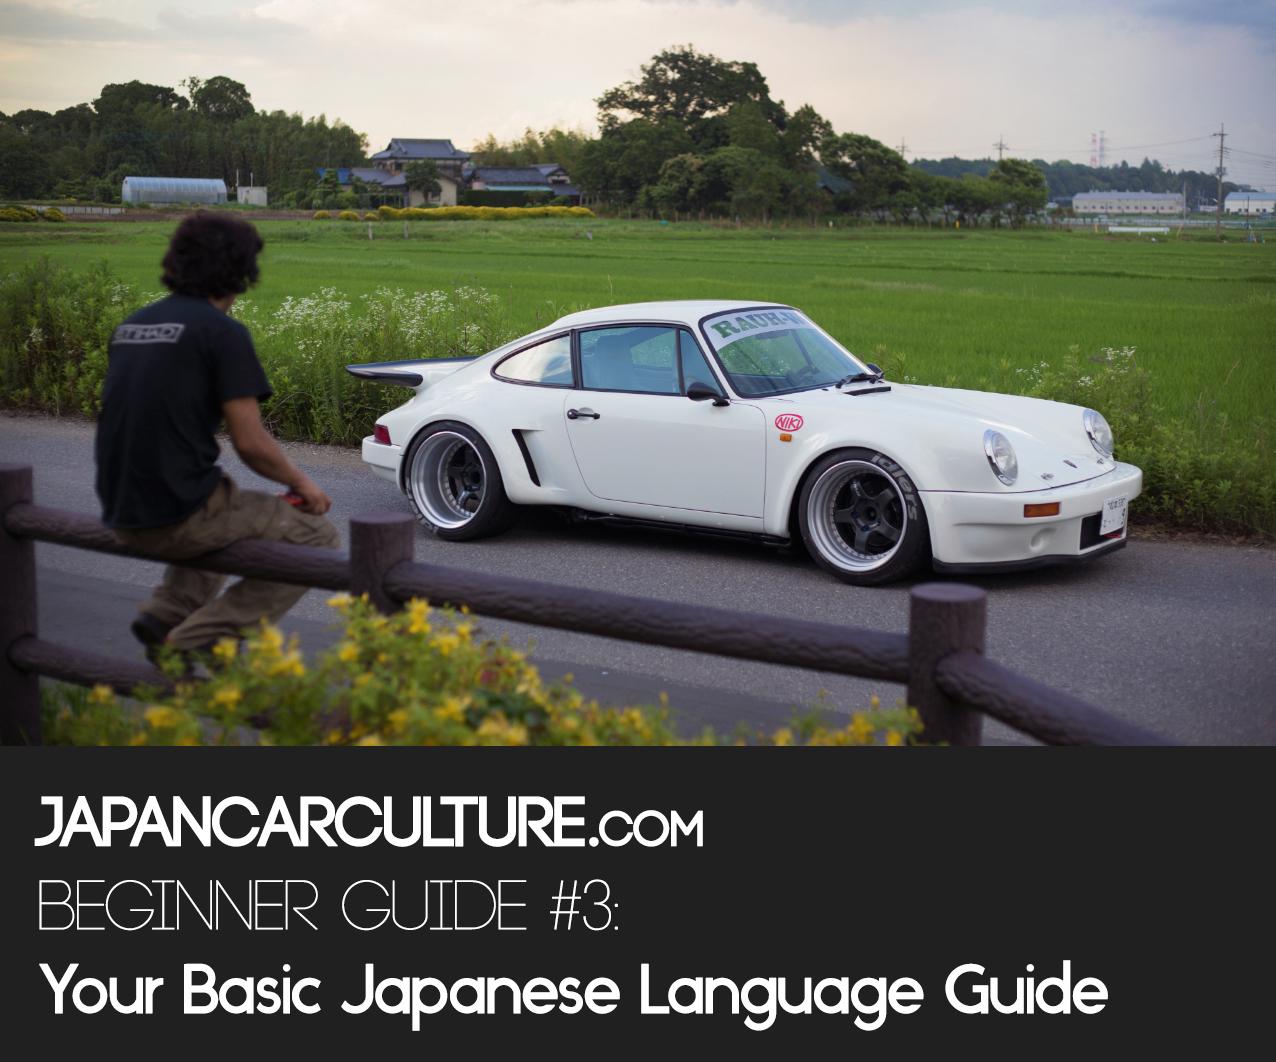 BasicJapaneseLanguageGuideHeaderConcept31.jpg